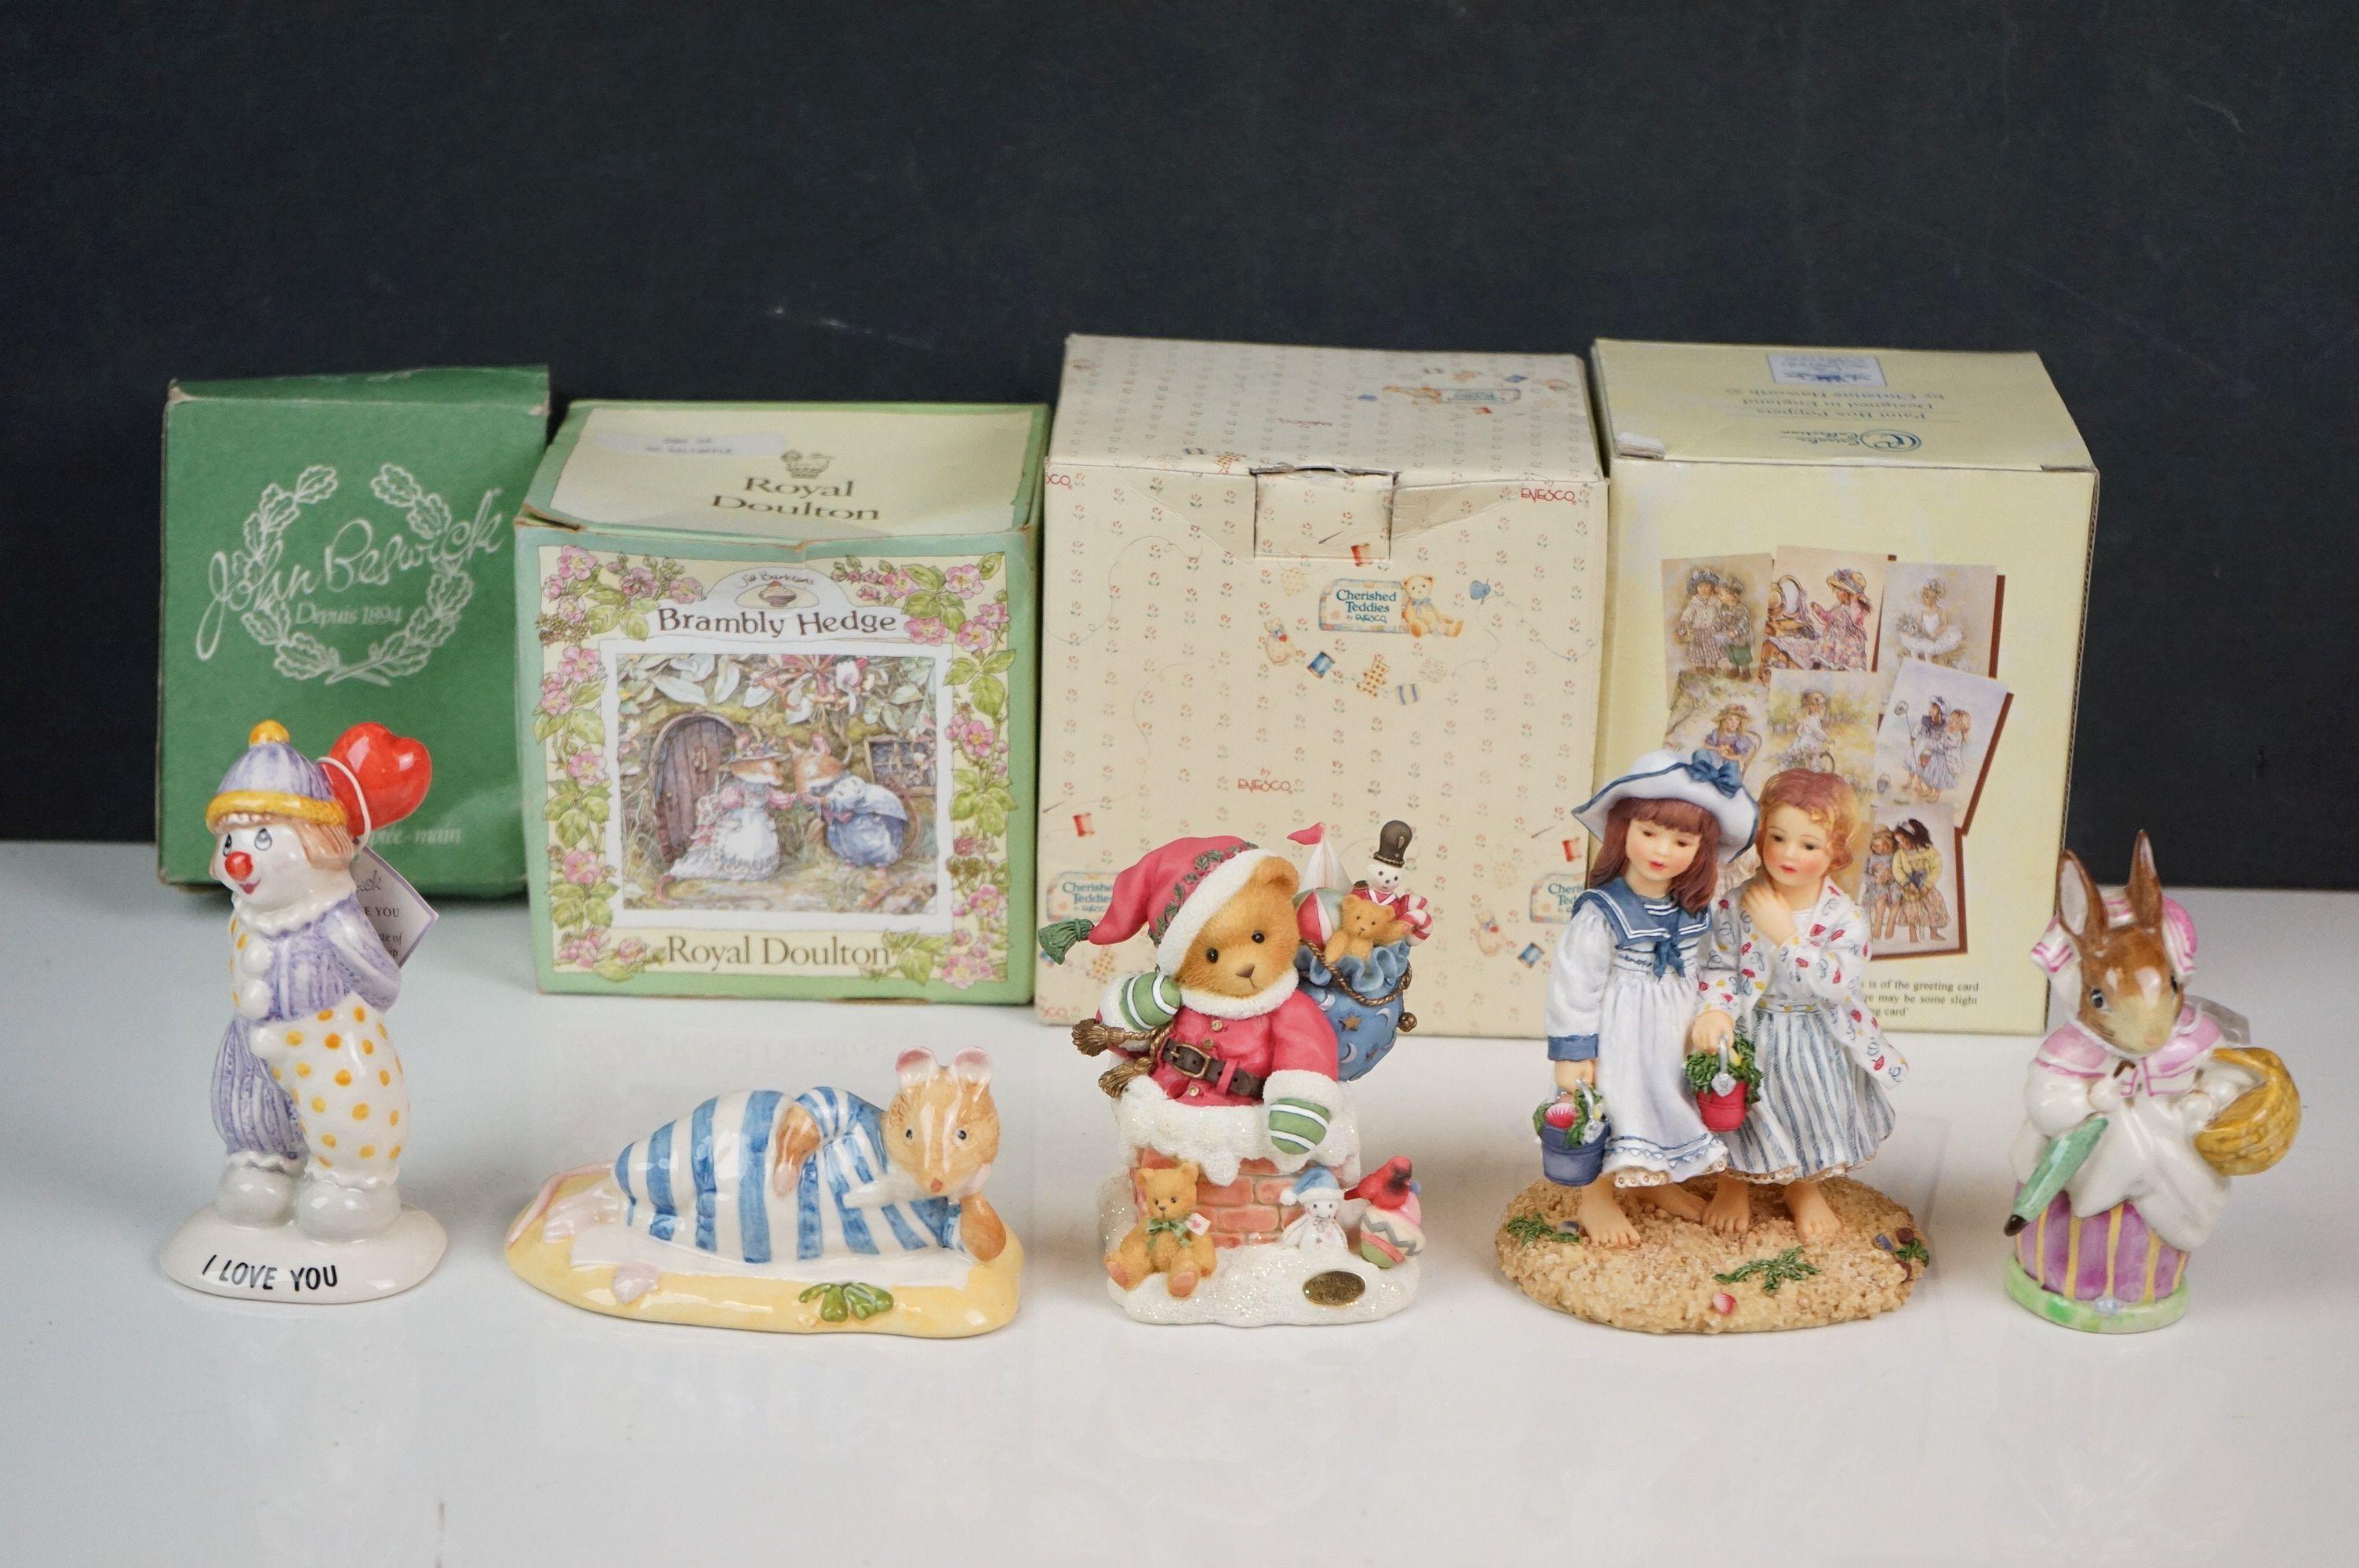 Five ceramic figures, to include Royal Doulton Mr Saltapple, Beswick Mrs Rabbit etc